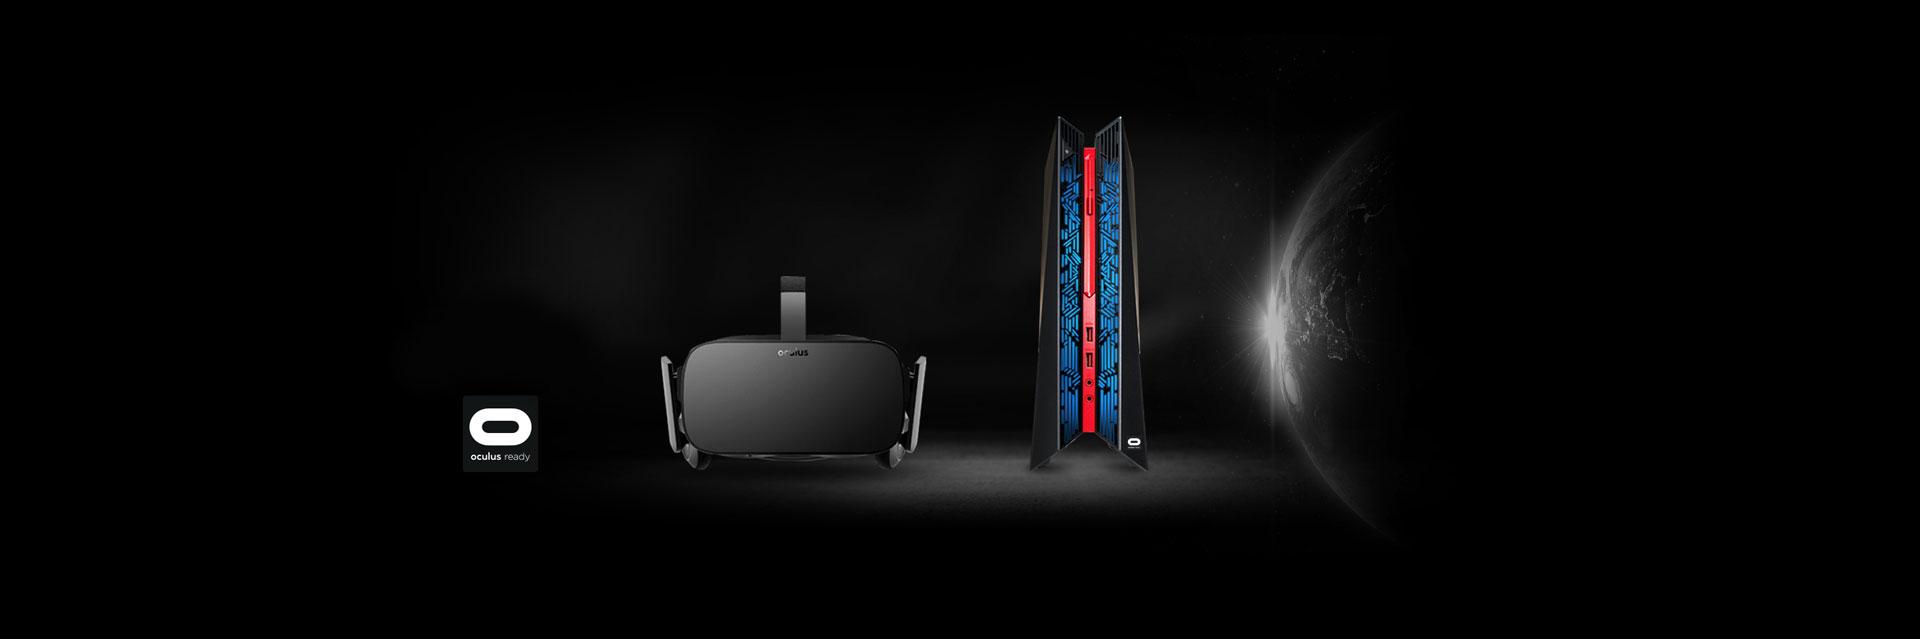 ROG G20CI Oculus Ready | ROG - Republic Of Gamers | ASUS Global